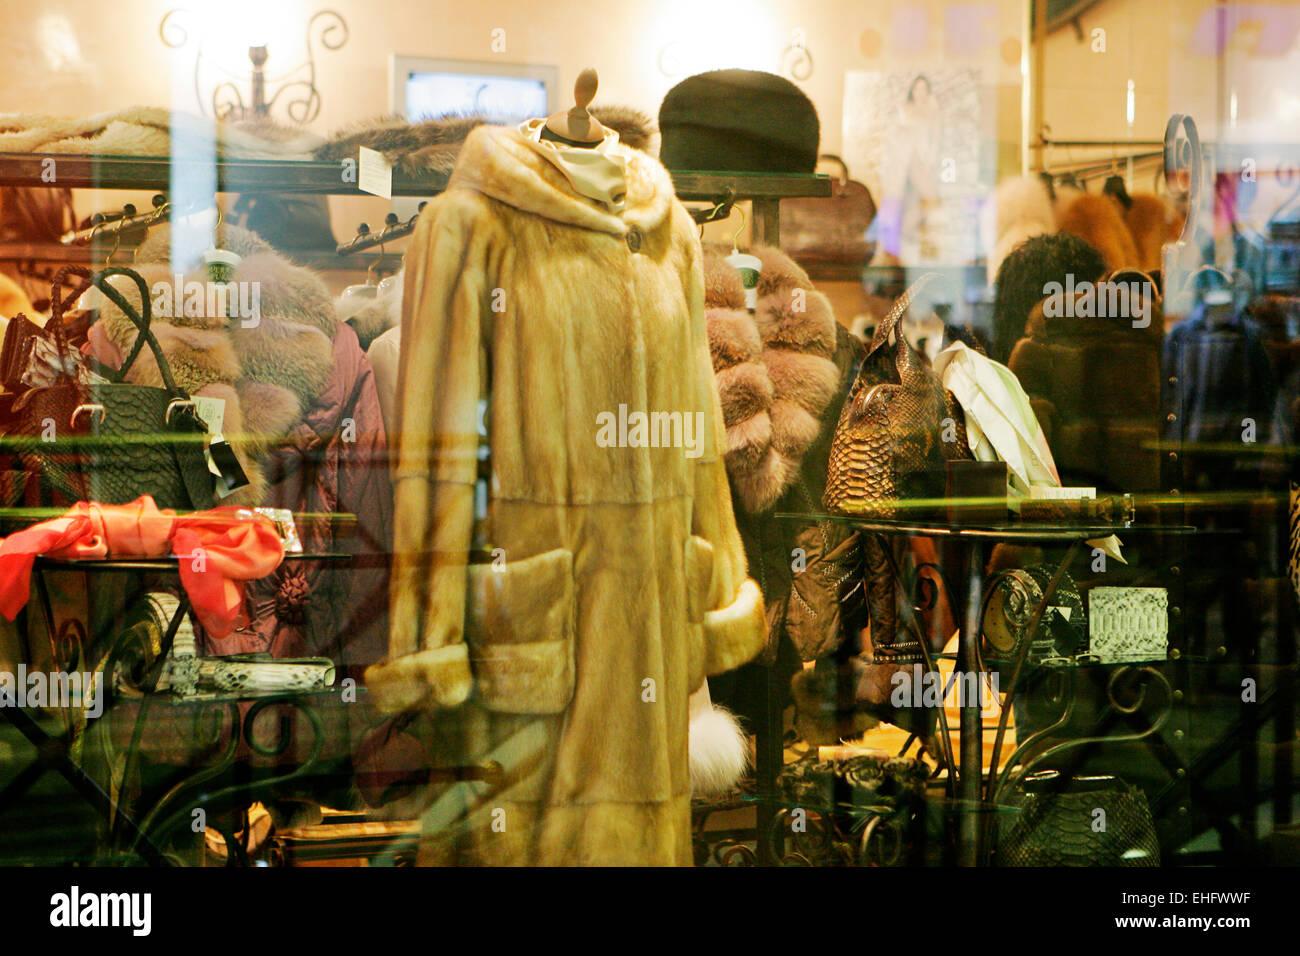 Fur coats for sale in shop windows in Plovdiv Bulgaria Stock Photo ...